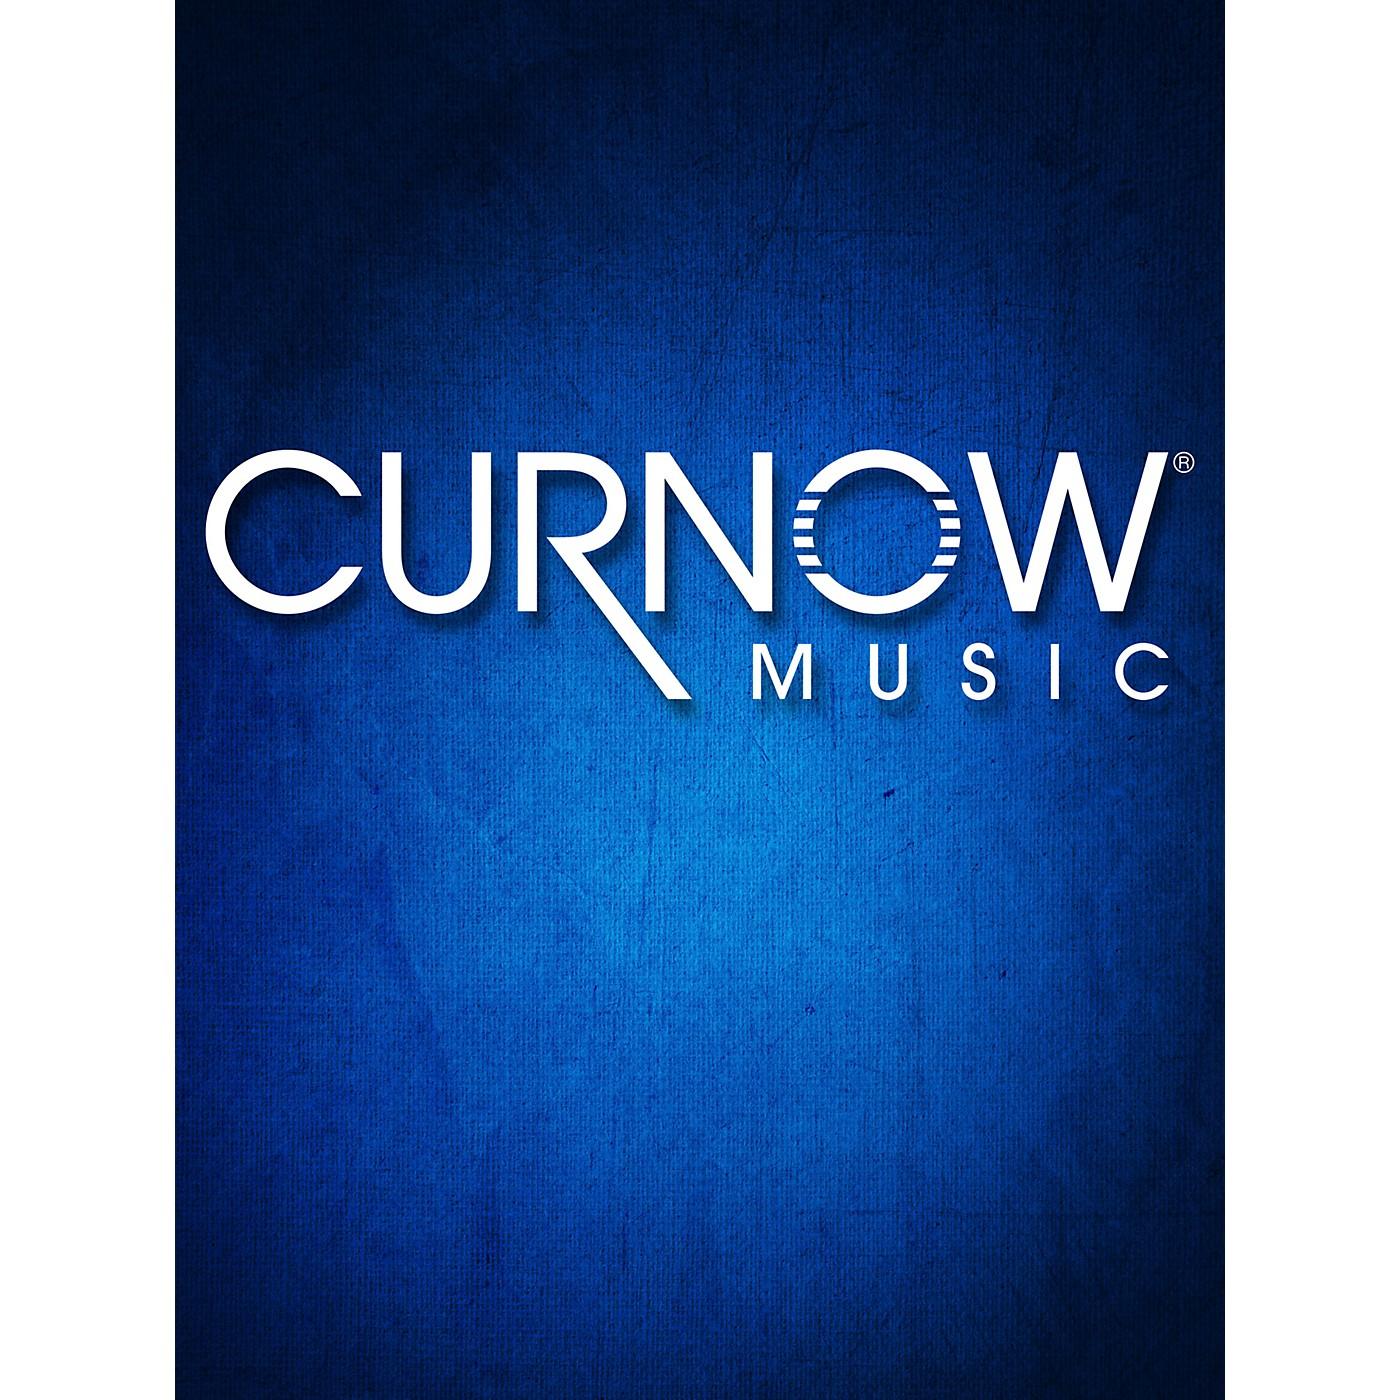 Hal Leonard Fantasy Jubiloso (Grade 3 - Score Only) Concert Band Level 3 Composed by Douglas Court thumbnail